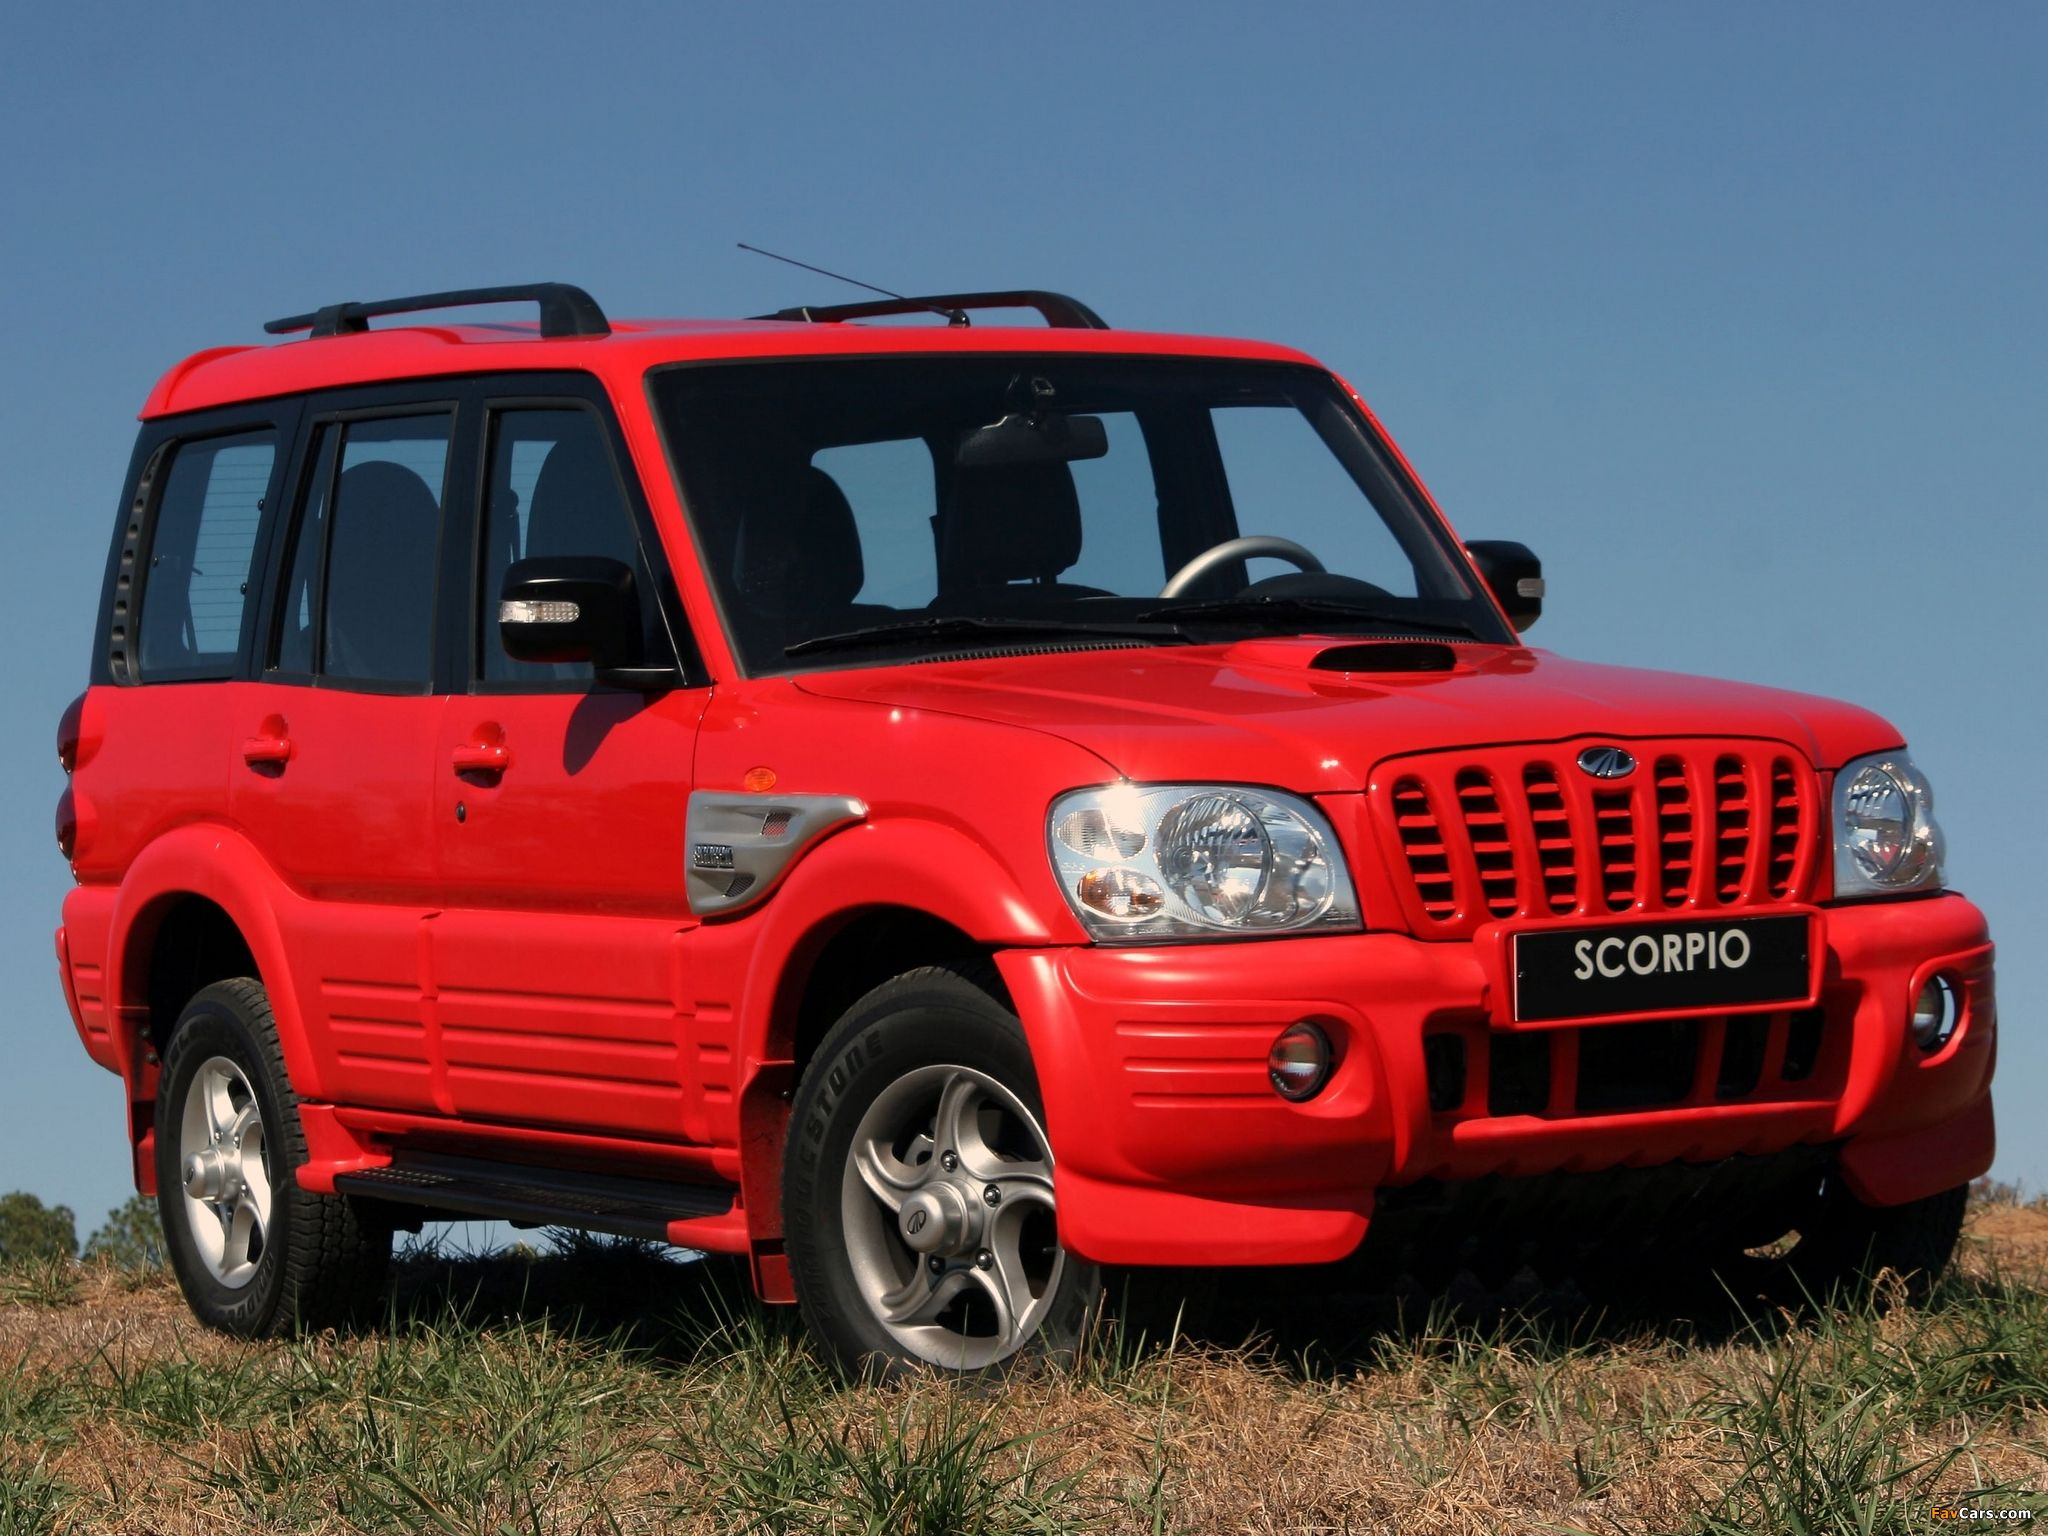 Mahindra Scorpio Red Suv Auv Vehicles Pinterest Cars Car